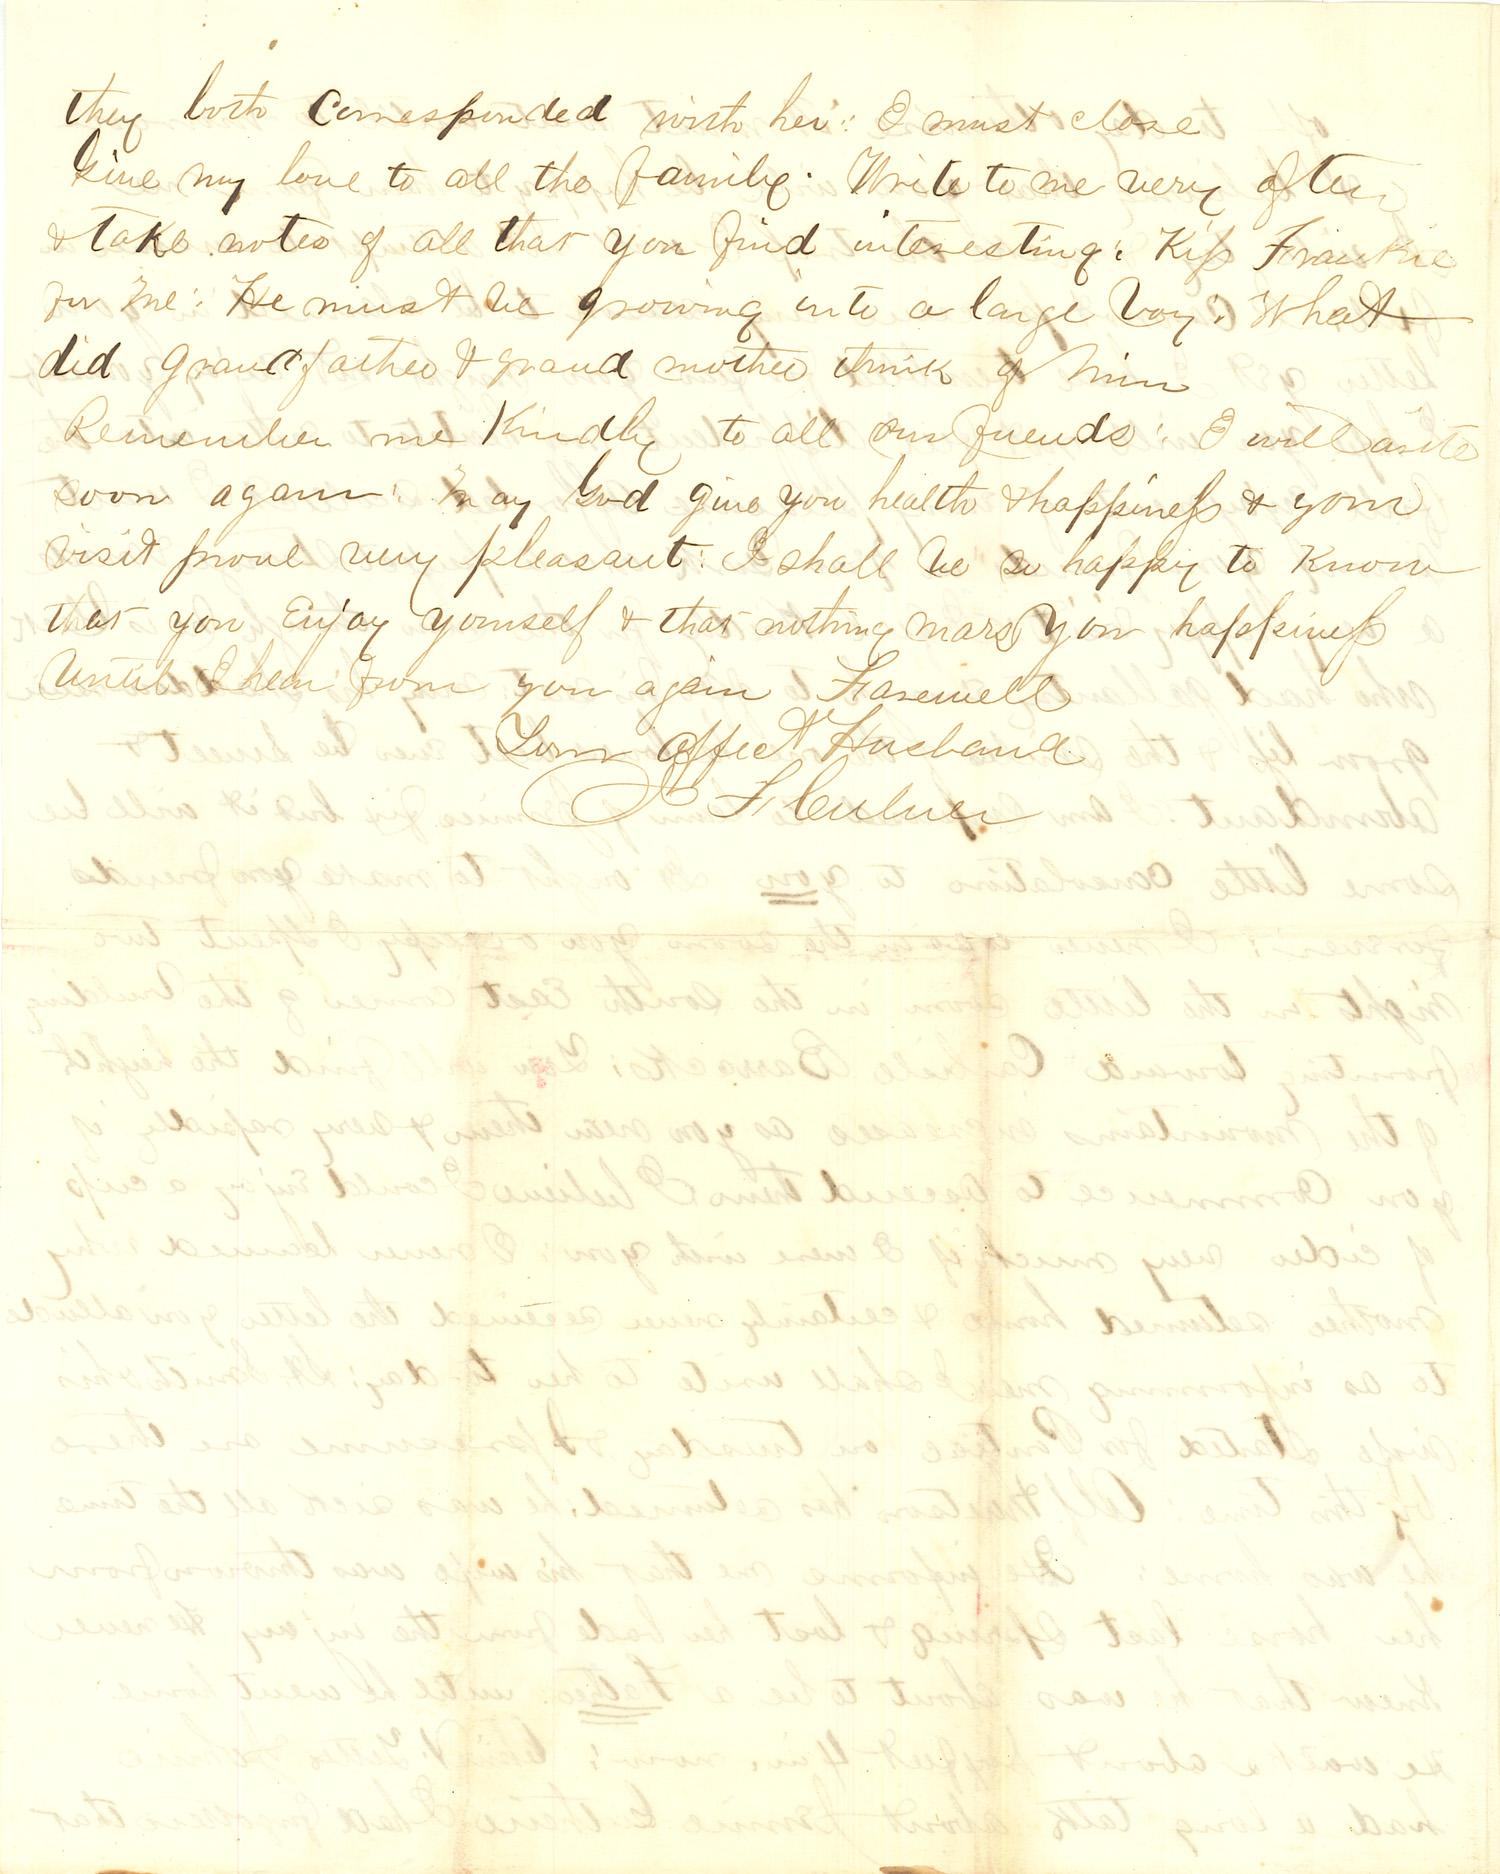 Joseph Culver Letter, September 3, 1863, Page 8